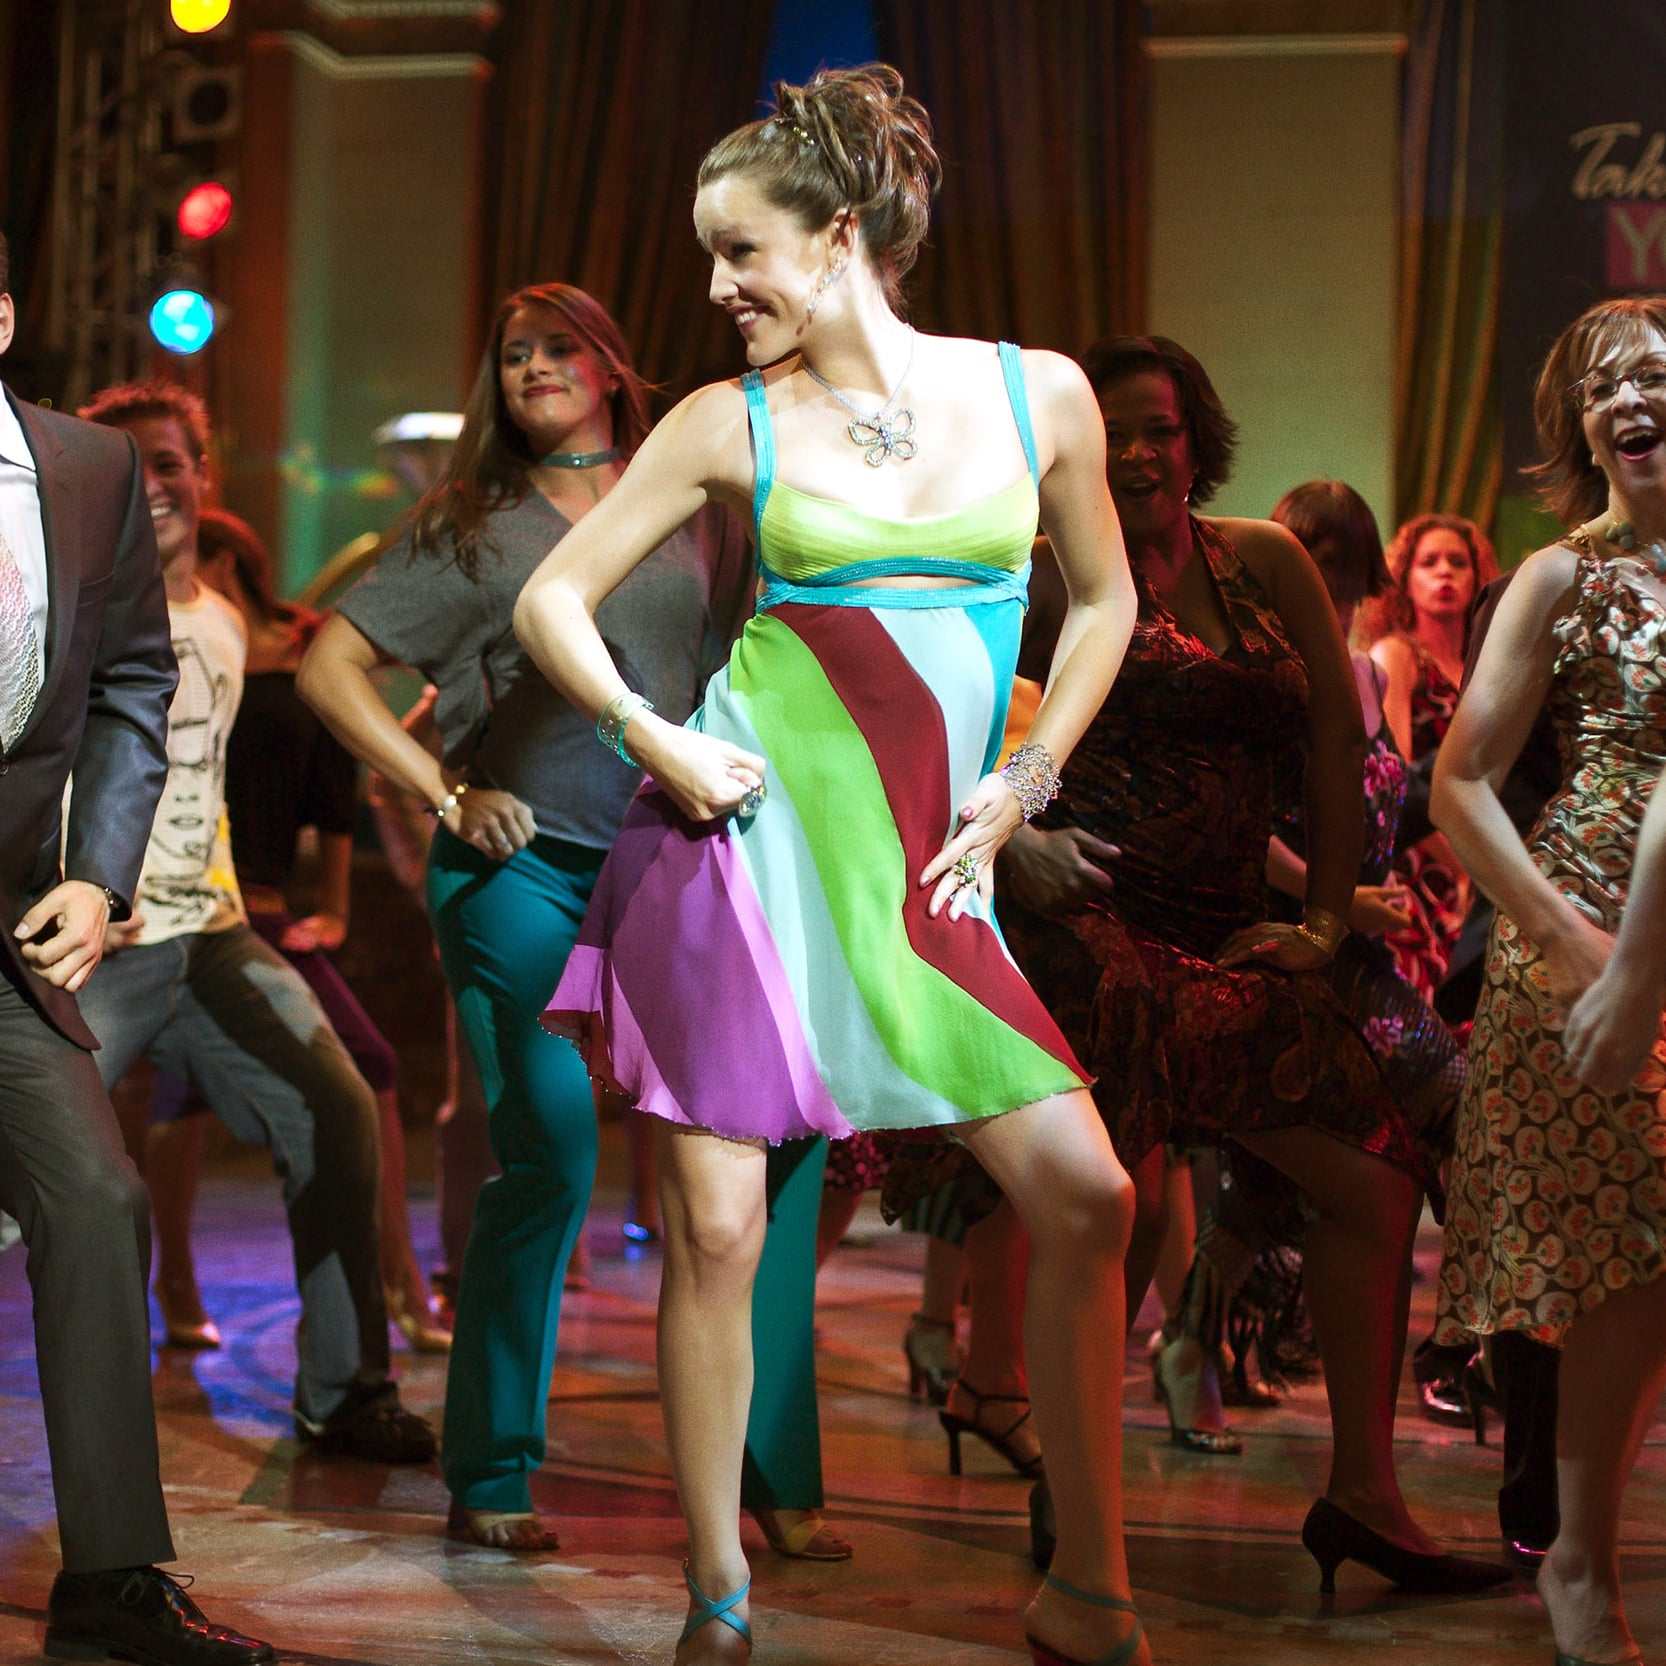 Jennifer Garner as Jenna Rink in the Famous 13 Going on 30 Dress | Shop the  13 Going on 30 Dress on Amazon | TikTok Trend | POPSUGAR Fashion UK Photo 2